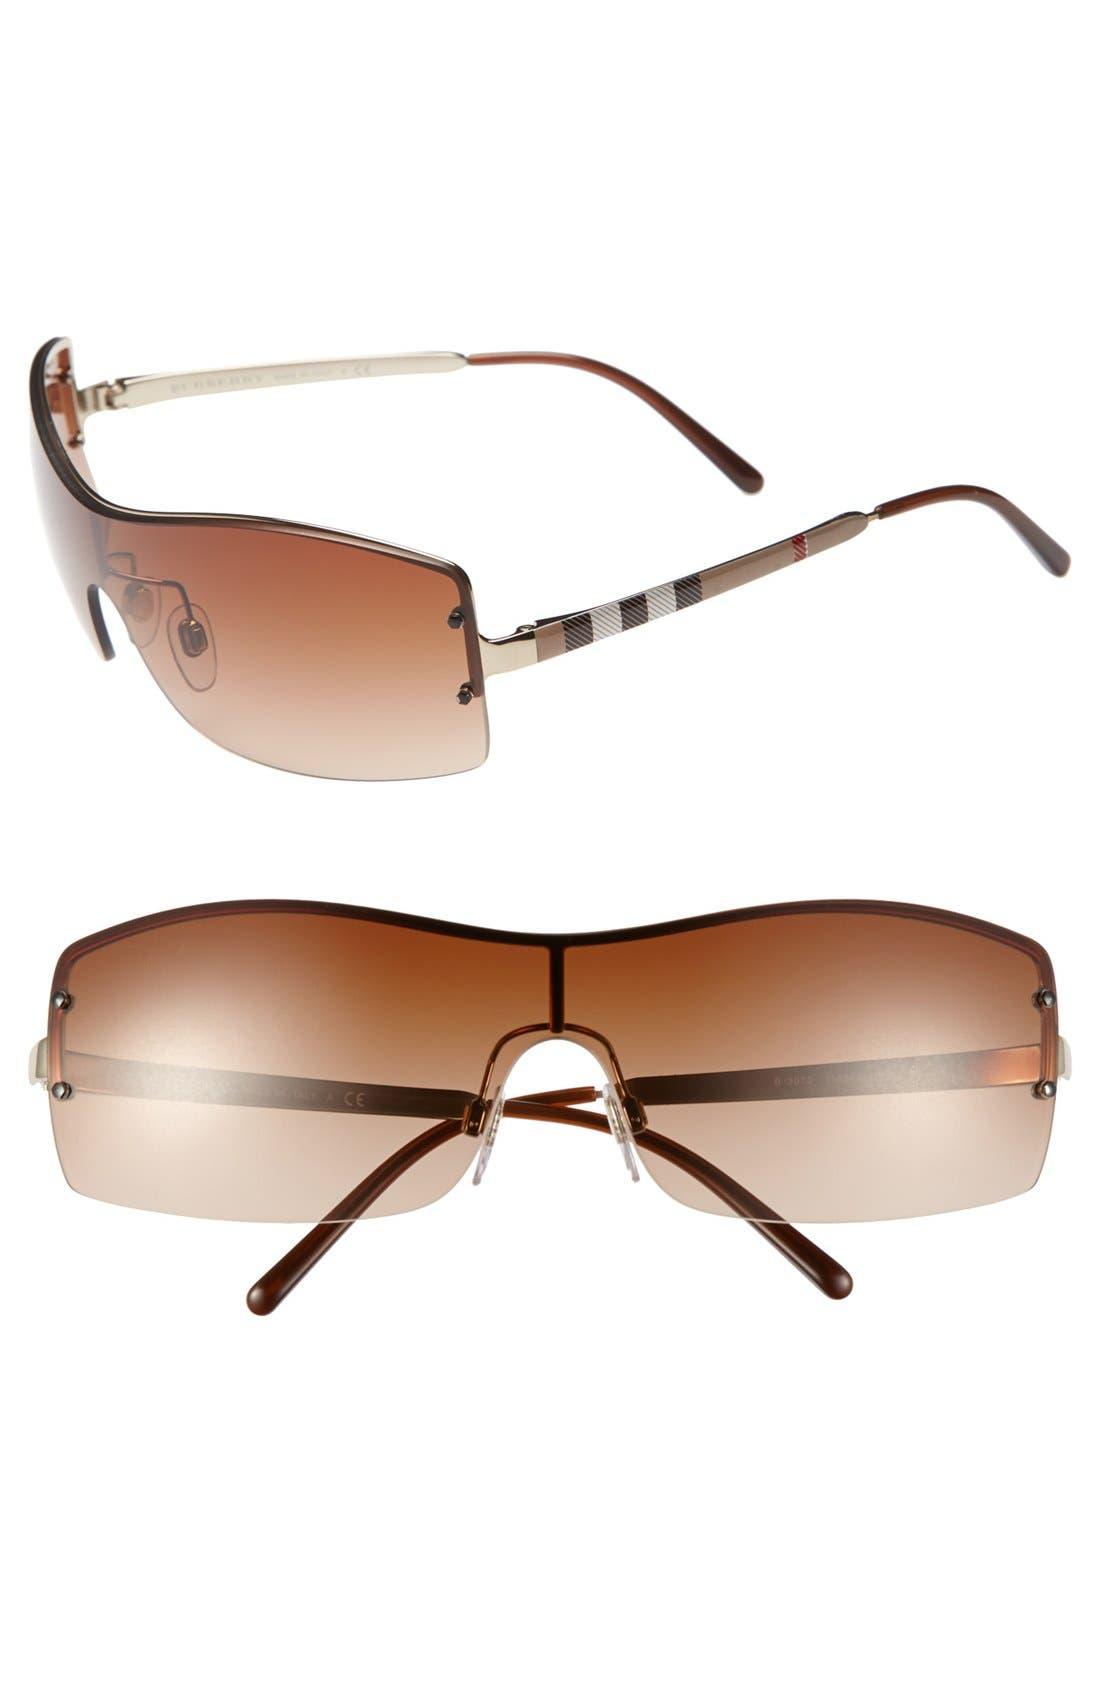 Main Image - Burberry 'House Check Foil' 70mm Shield Sunglasses